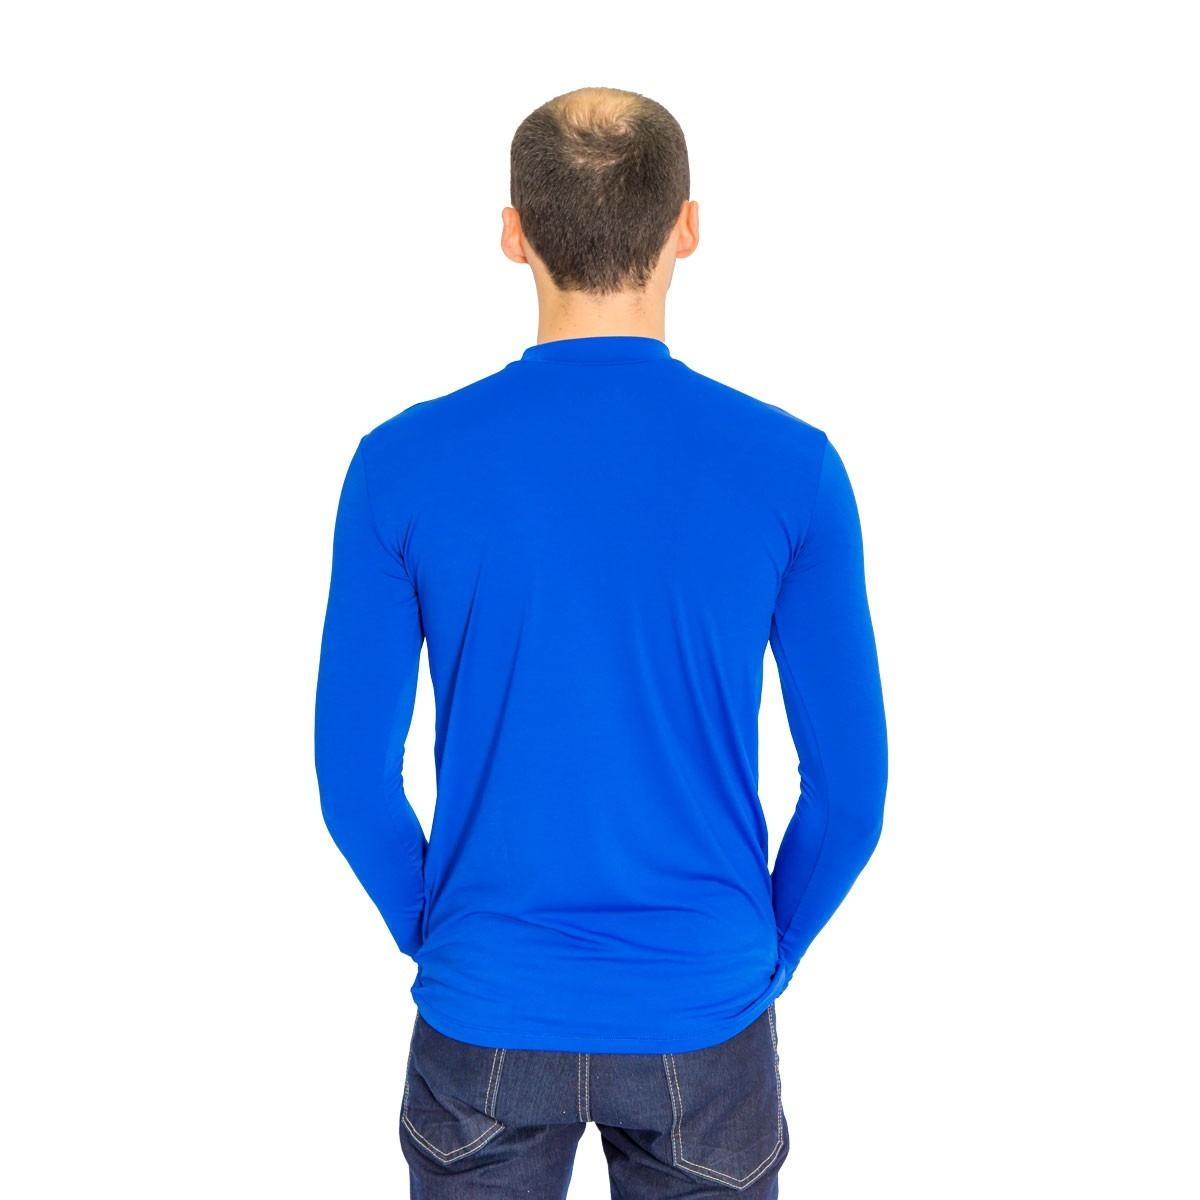 camiseta térmica masculina segunda pele azul royal off. Carregando zoom. e1c151aa11237